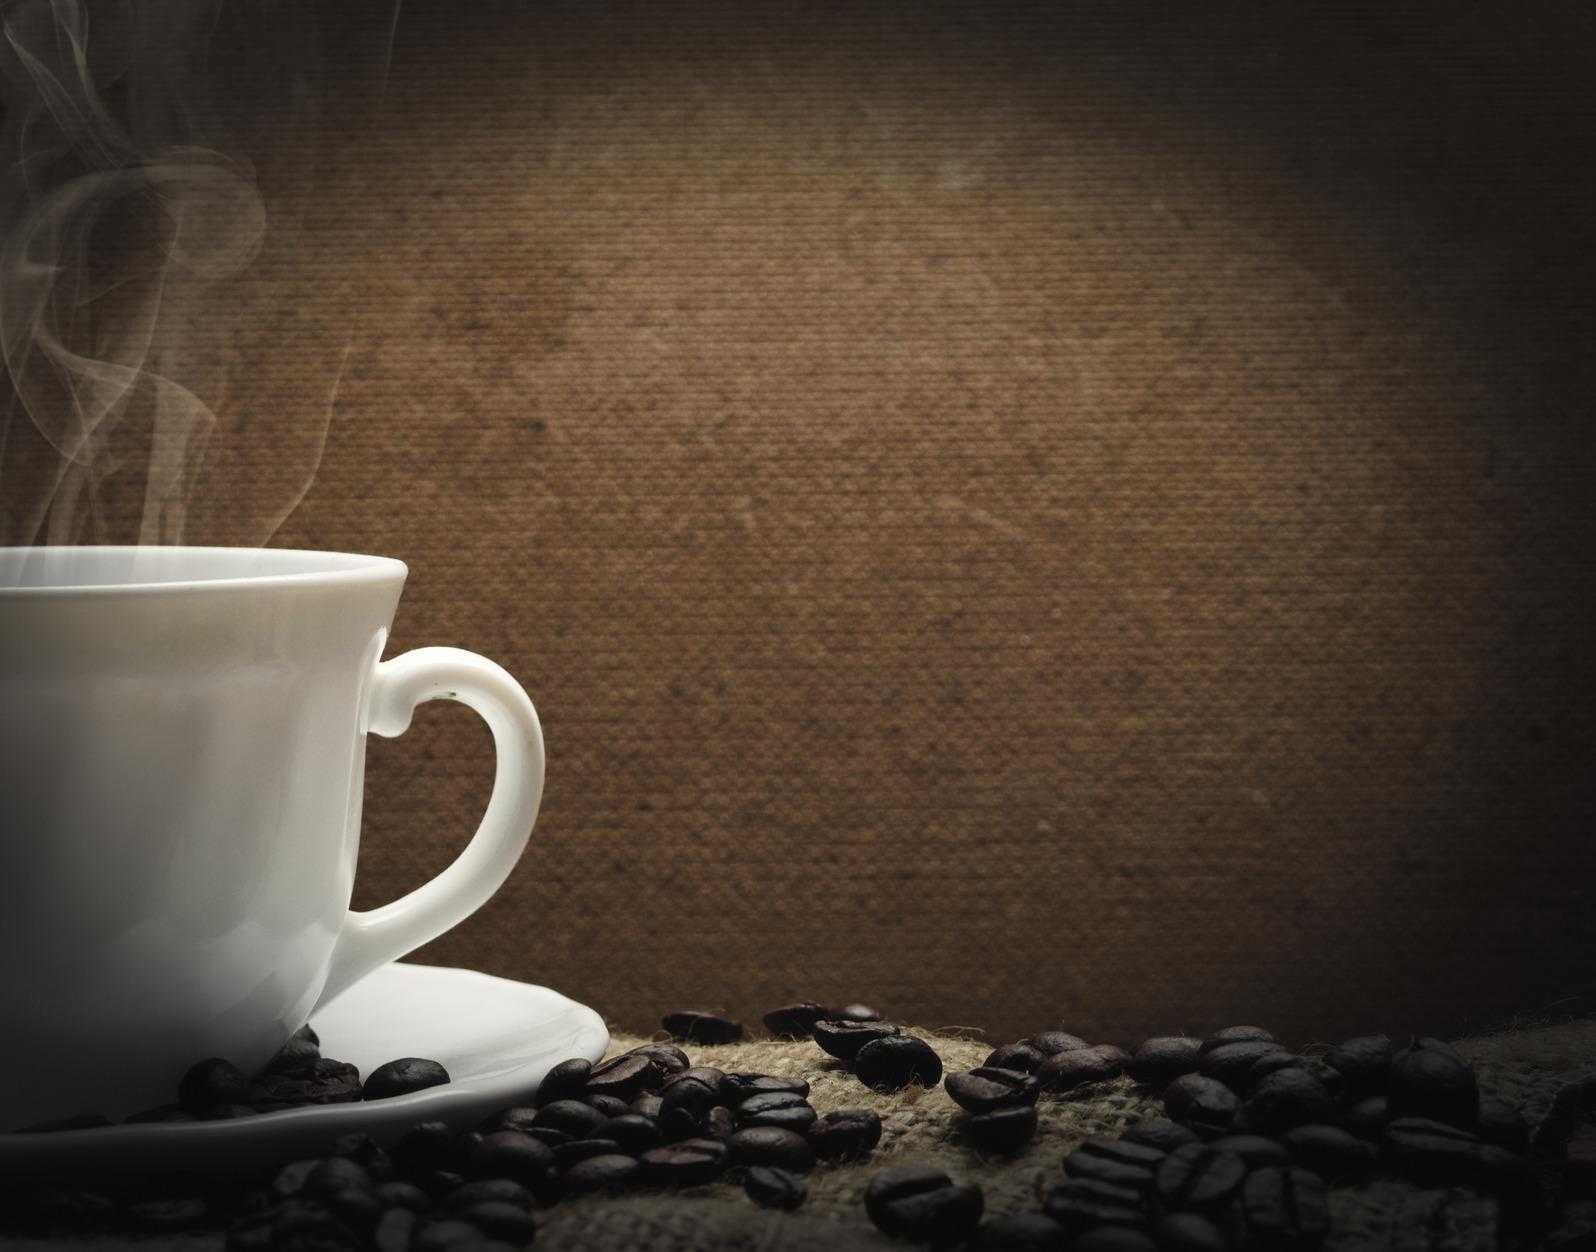 photodune-639754-coffee-m